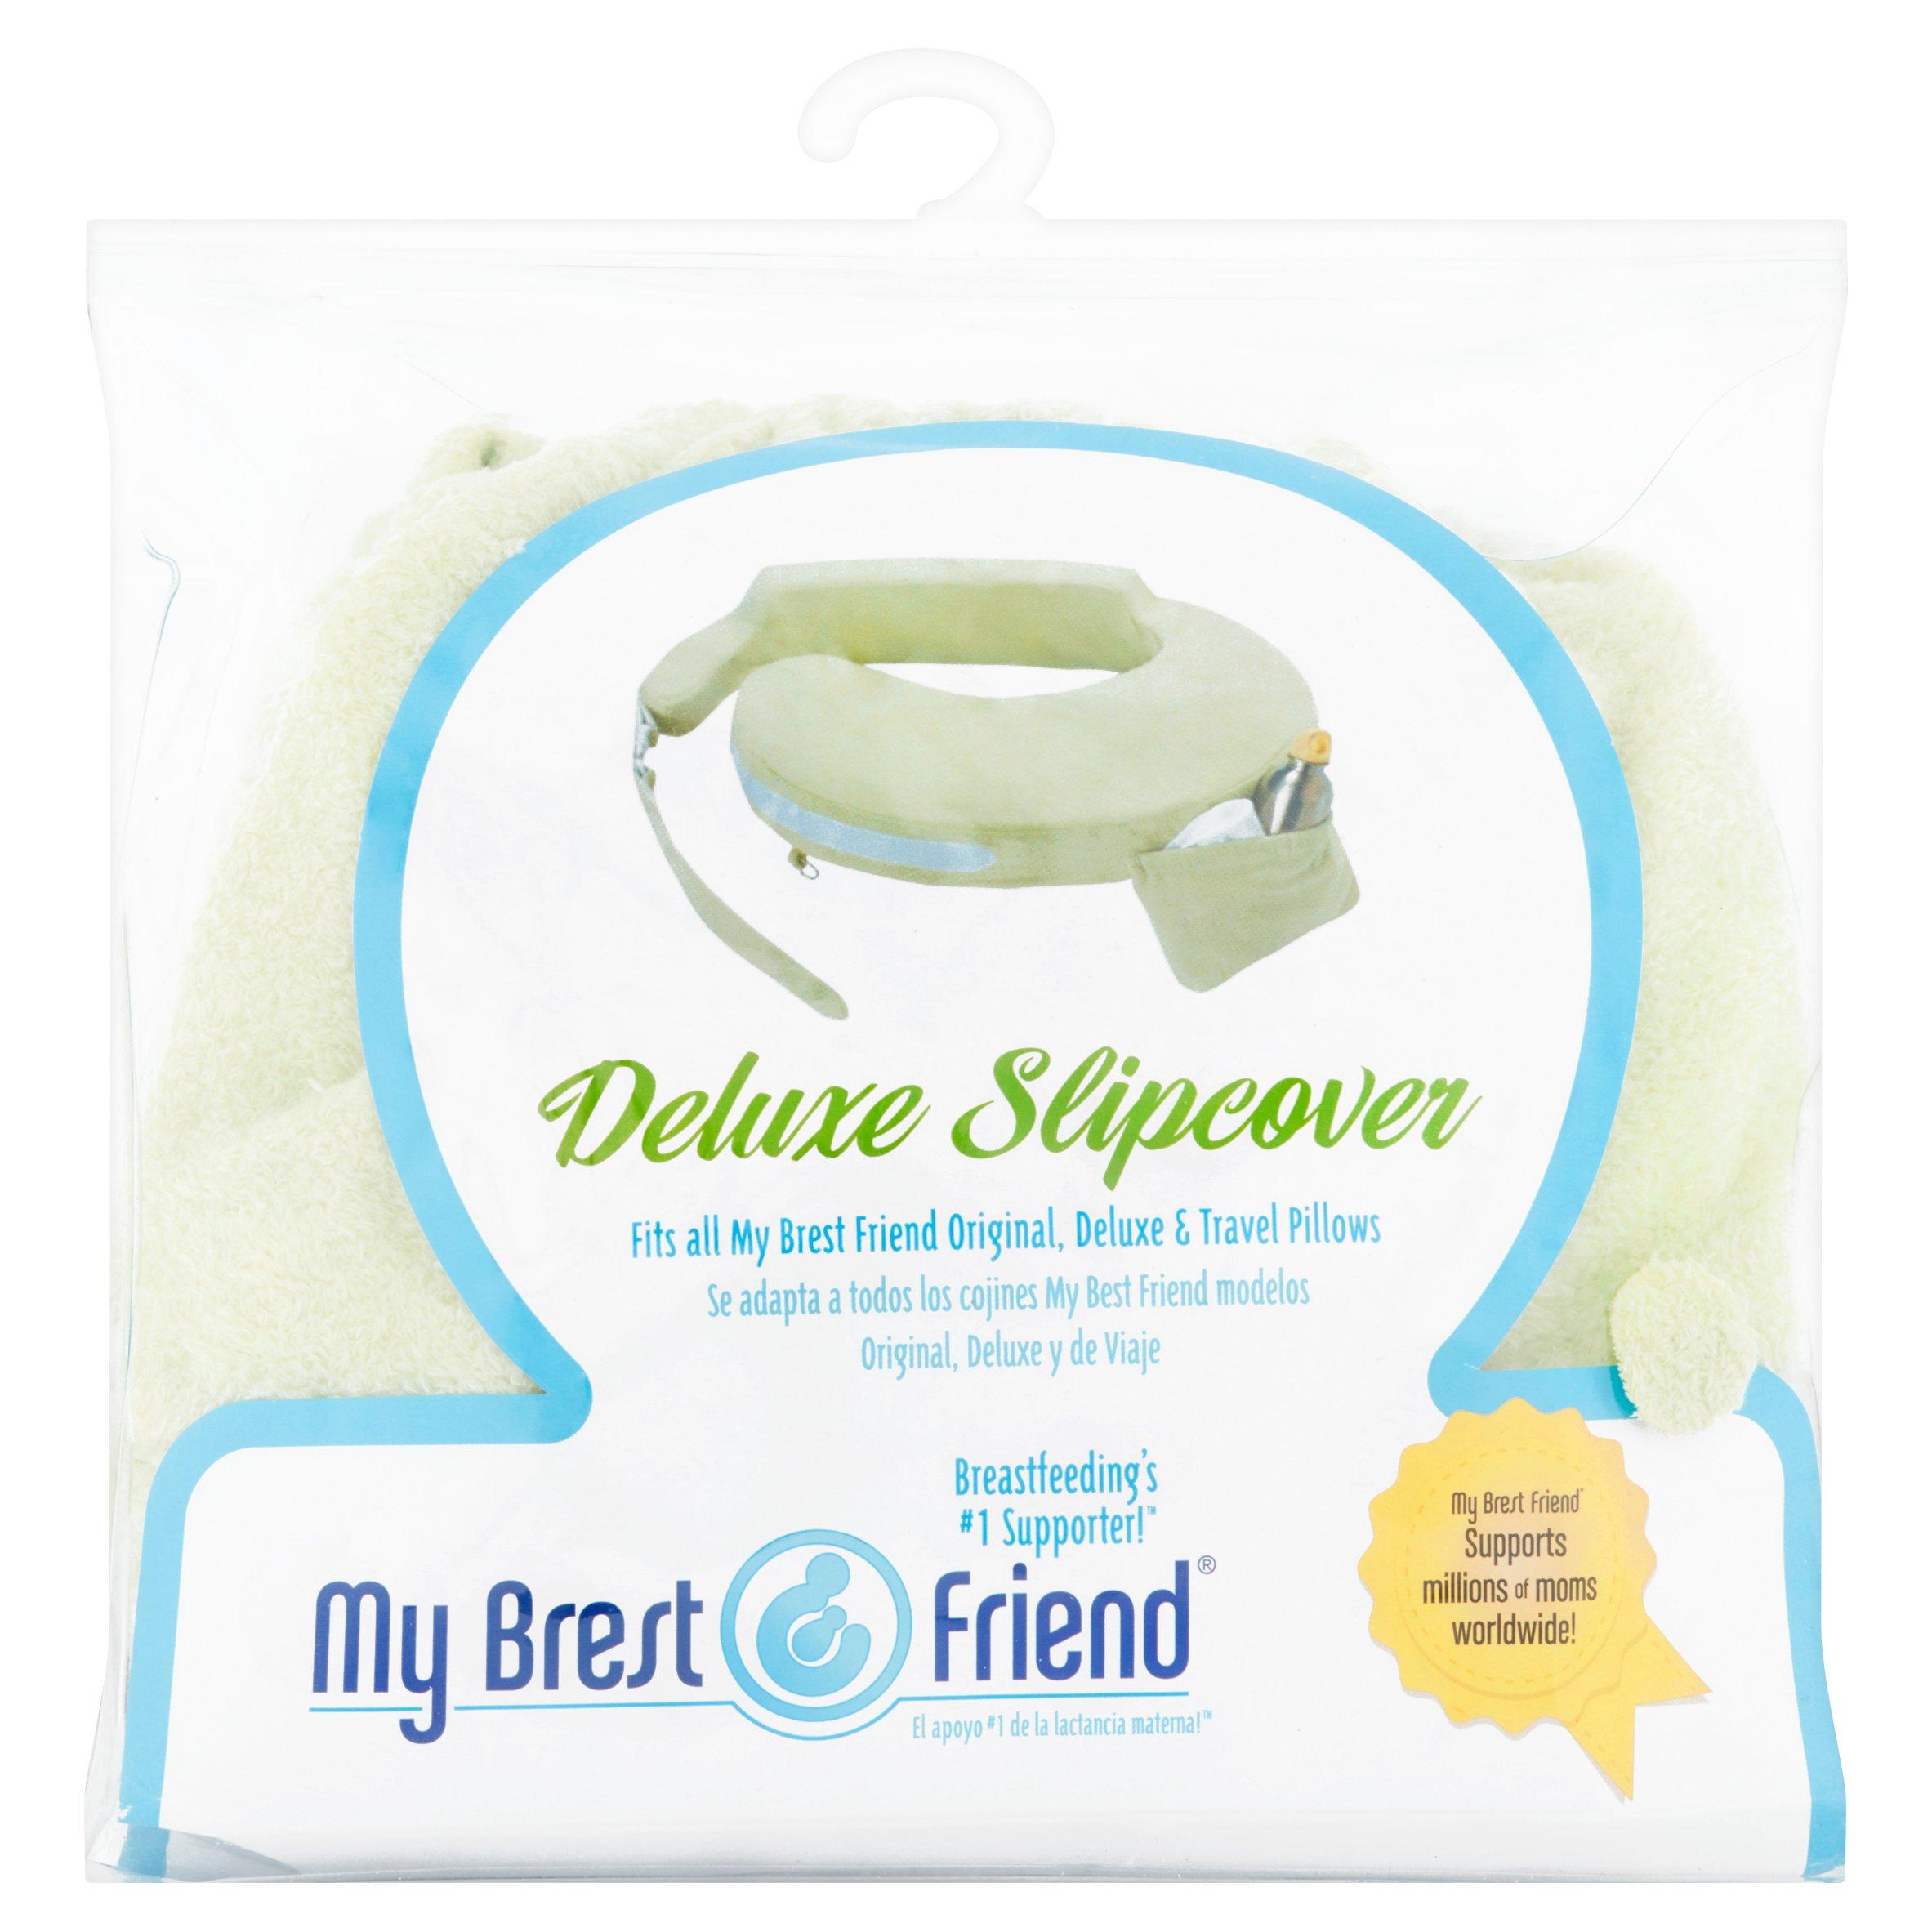 My Brest Friend Deluxe Slipcover